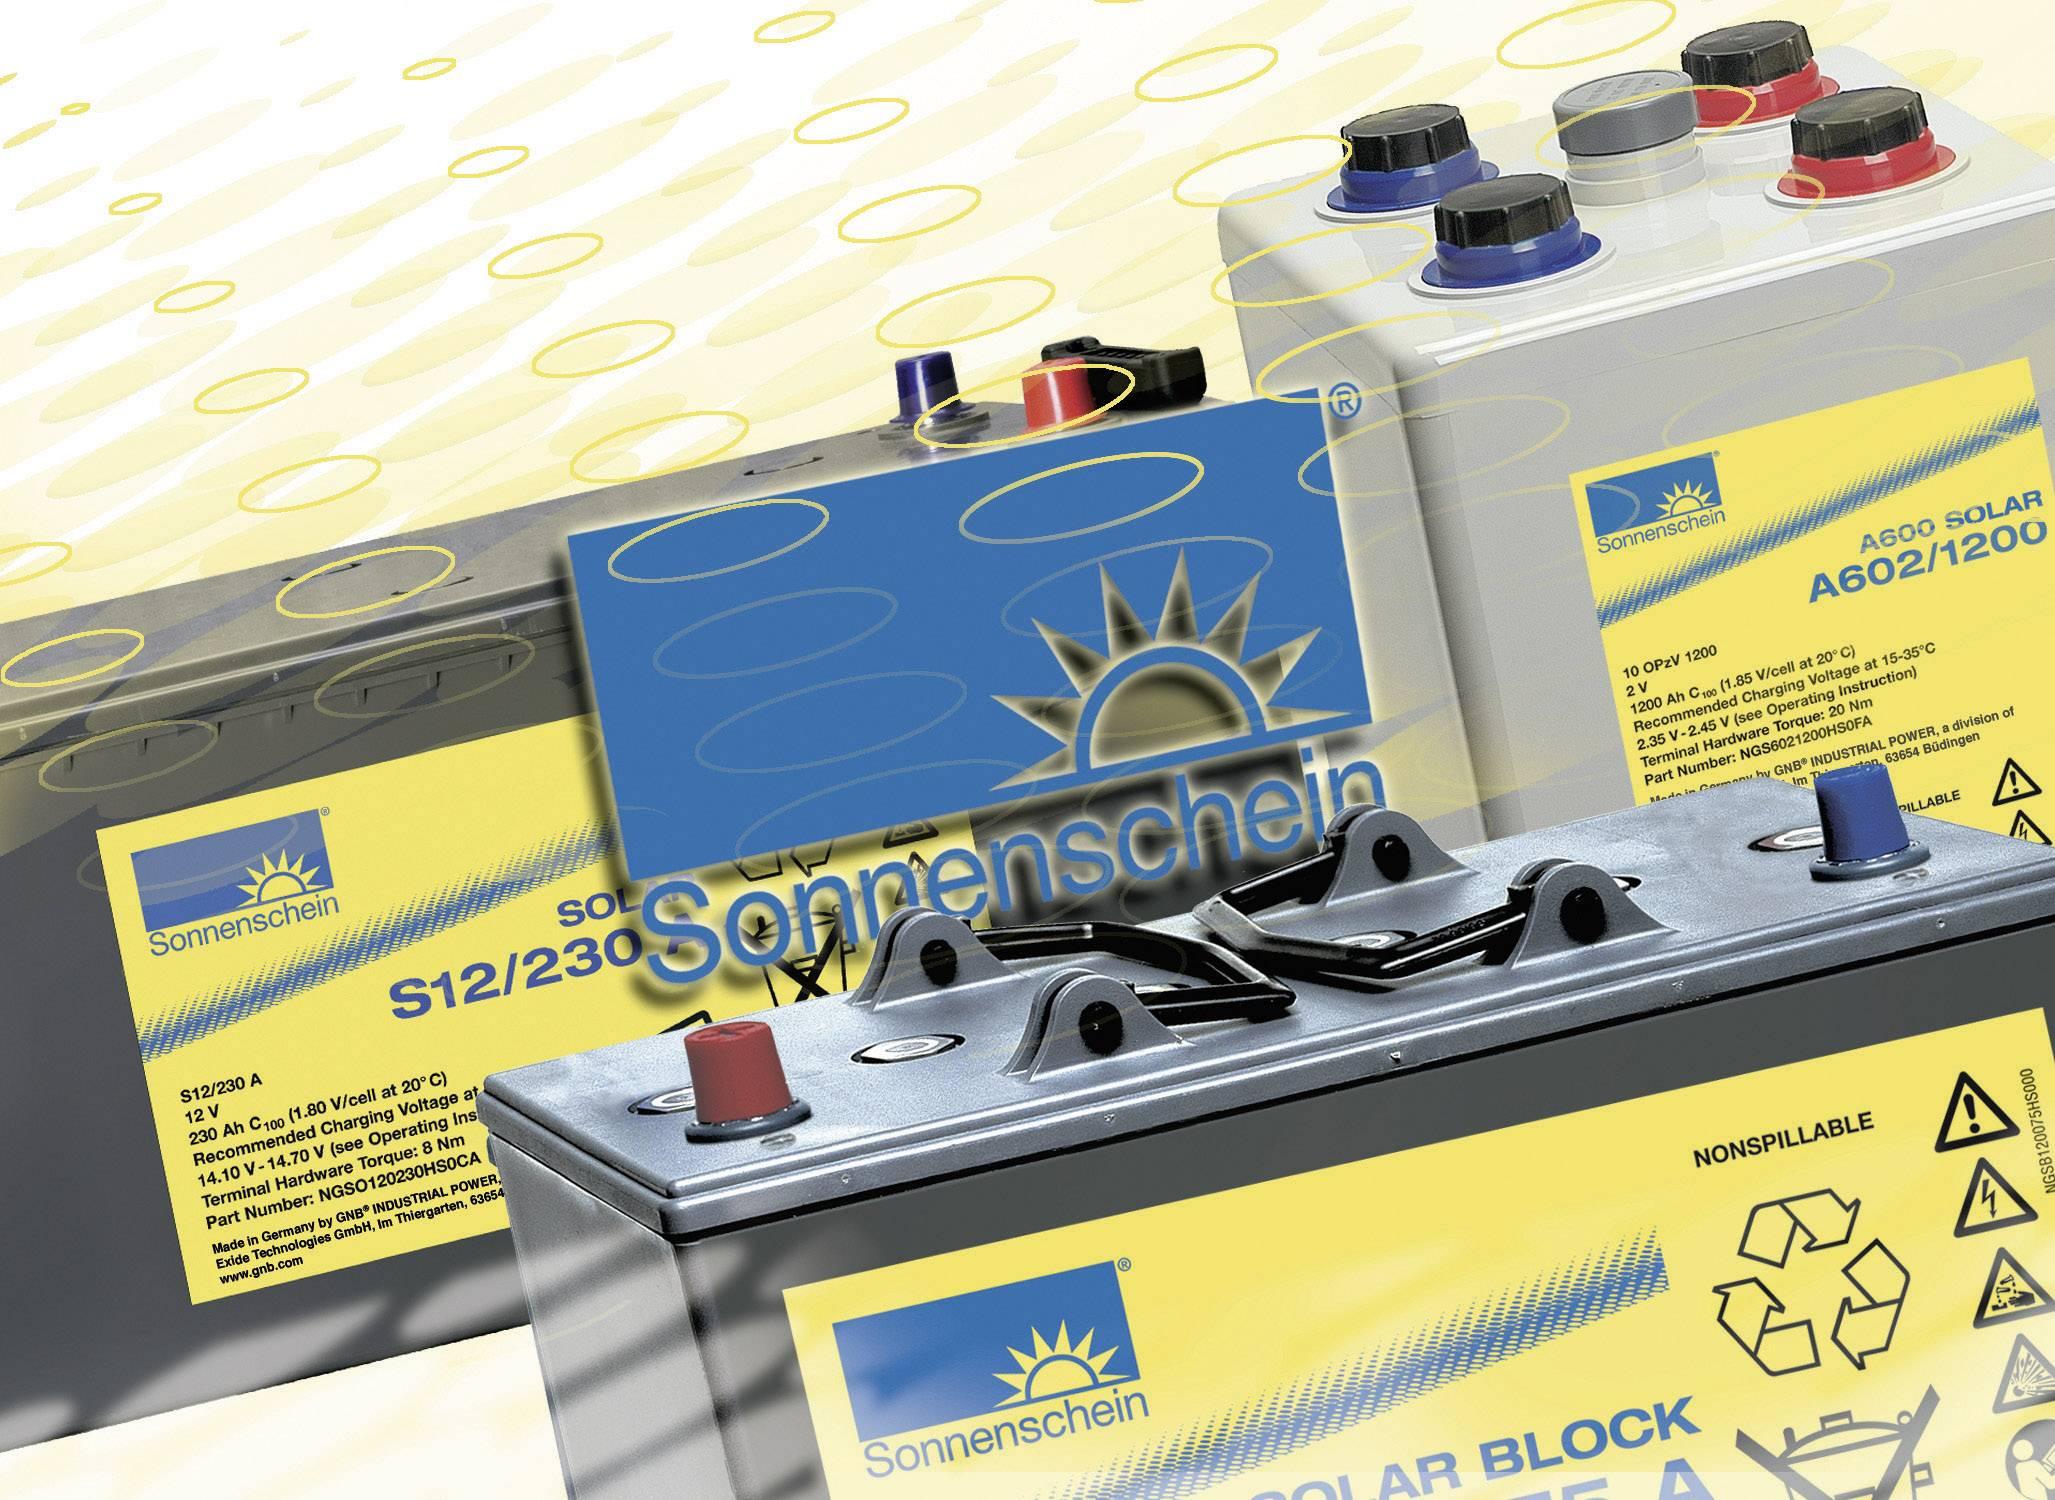 Solárny akumulátor 90Ah